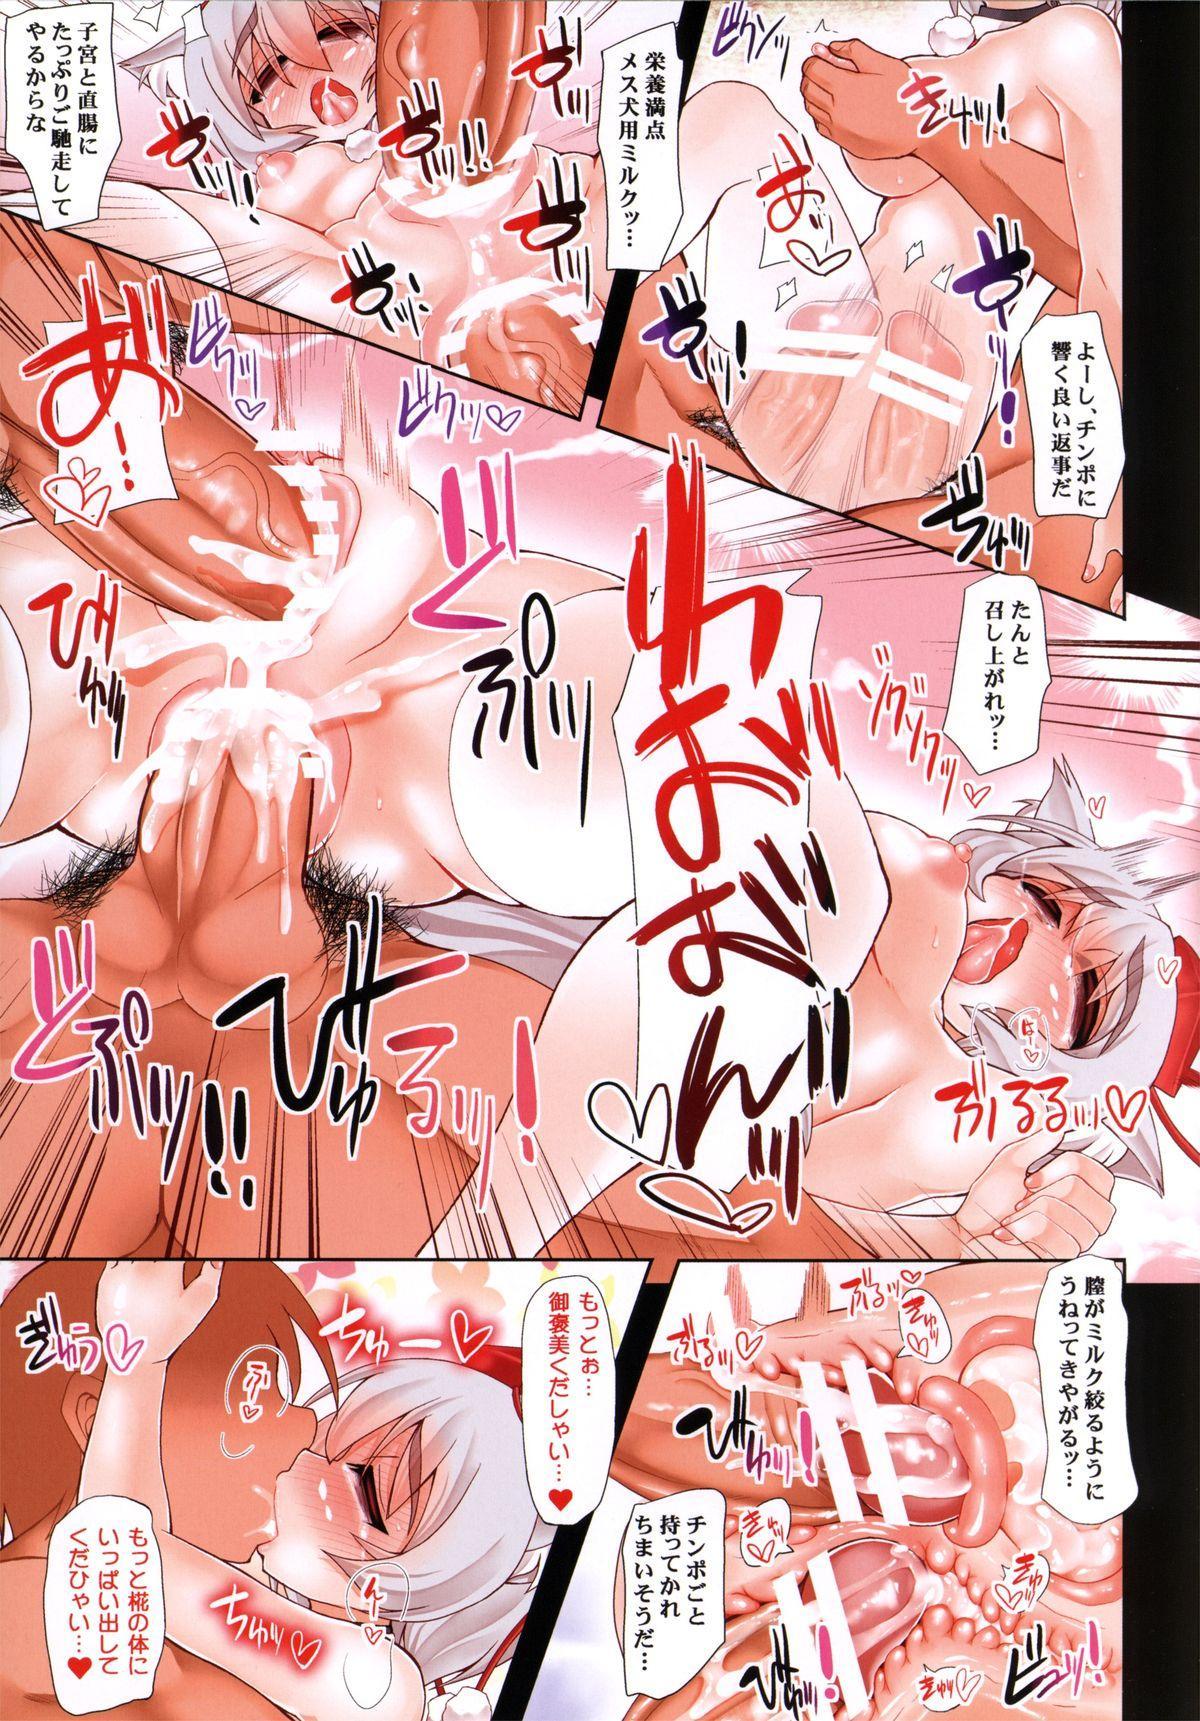 Oidemase Youkai no Yama 12